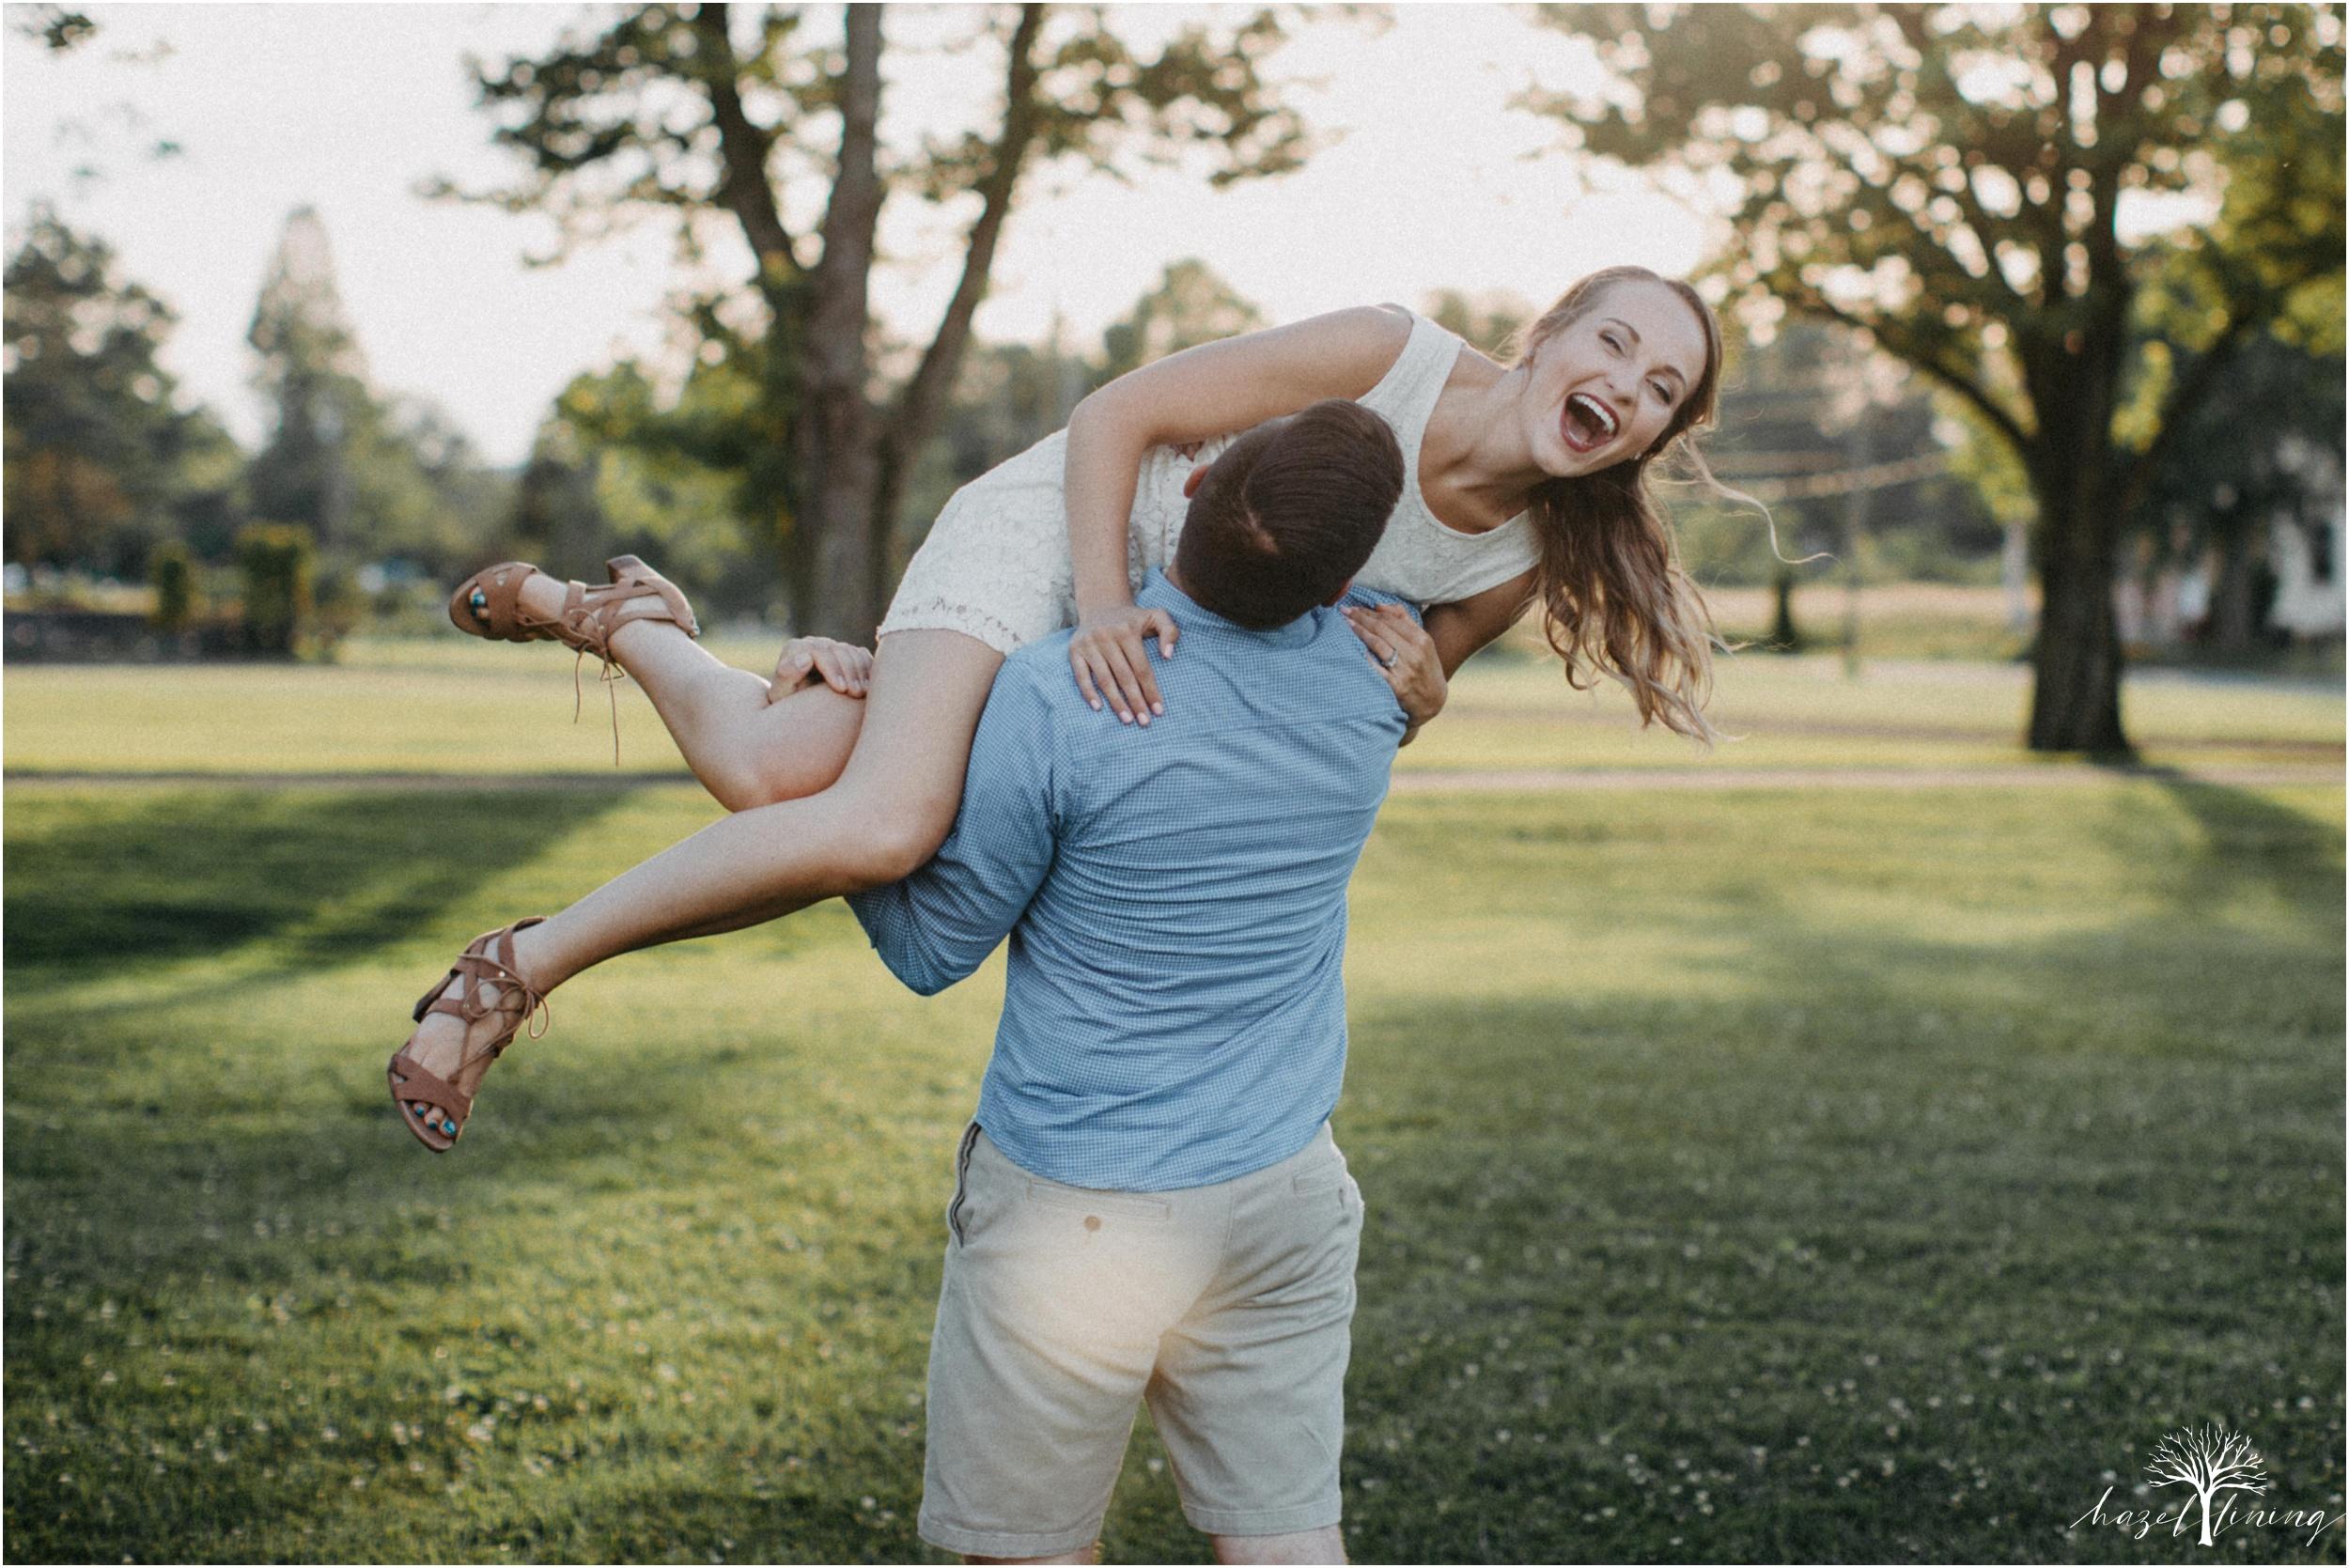 rachel-warner-chris-niedrist-the-farm-bakery-and-events-quakertown-pa-summer-engagement-hazel-lining-photography-destination-elopement-wedding-engagement-photography_0015.jpg